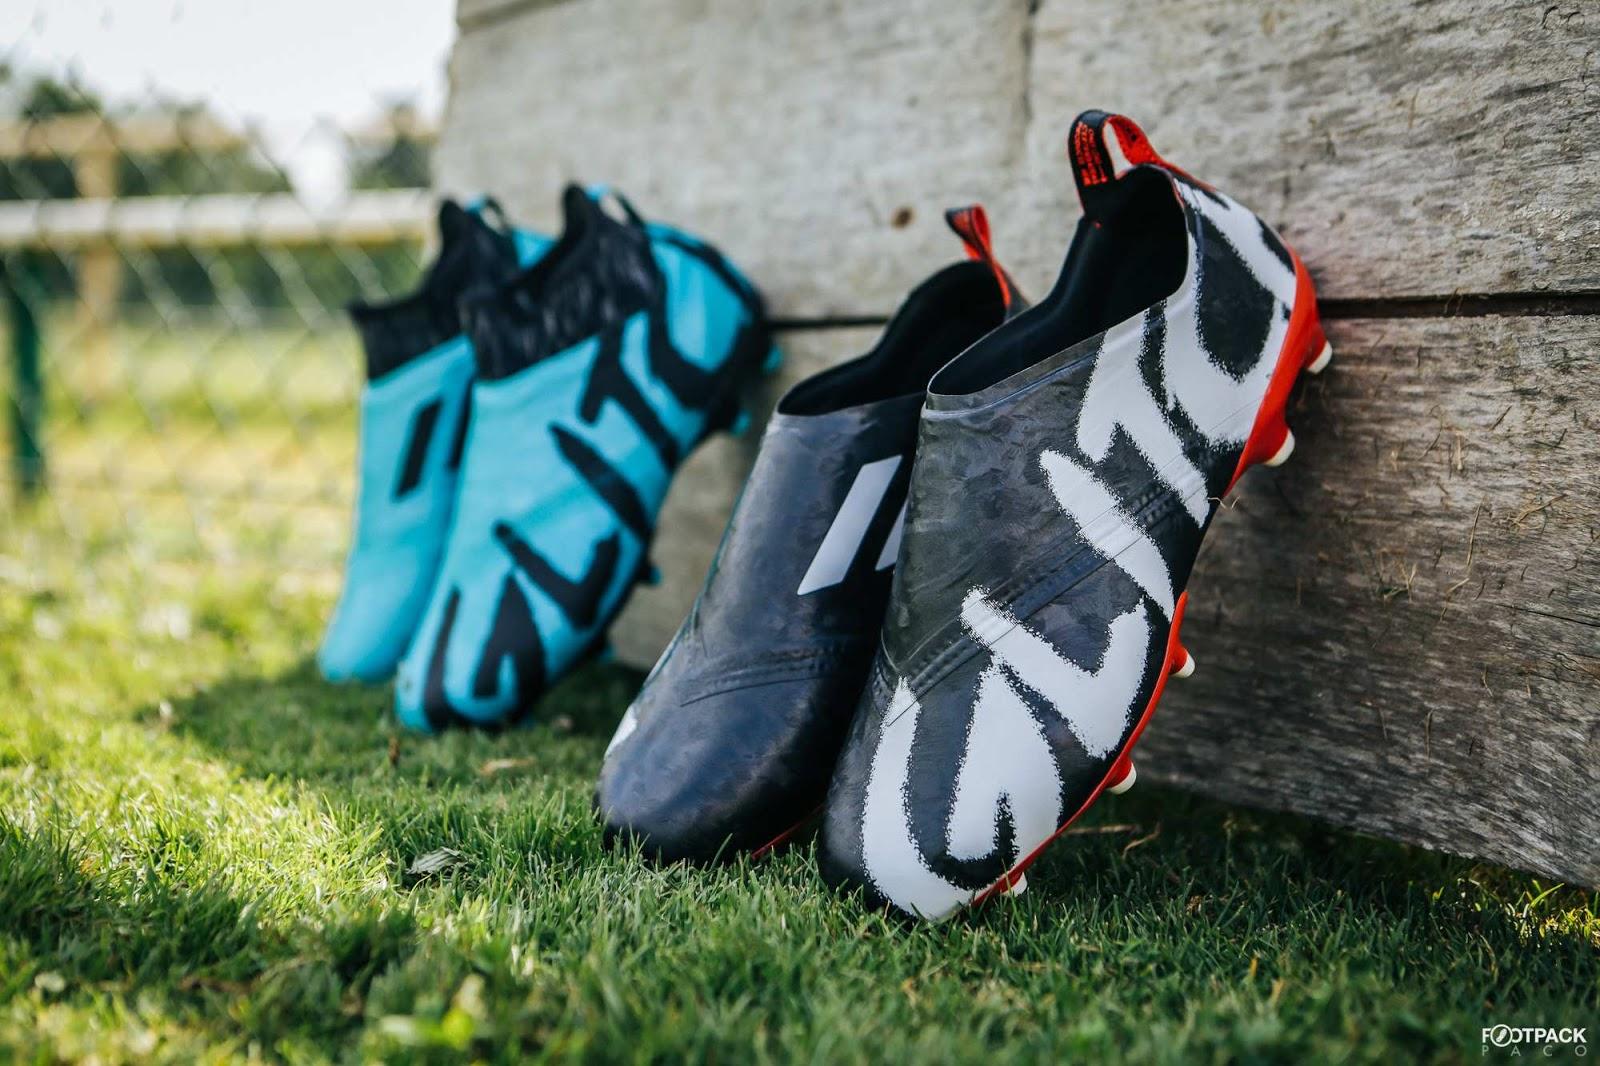 c12888126a00b6 Adidas glitch devo skin boots pack released leaked soccer jpg 1600x1066 Glitch  shoes